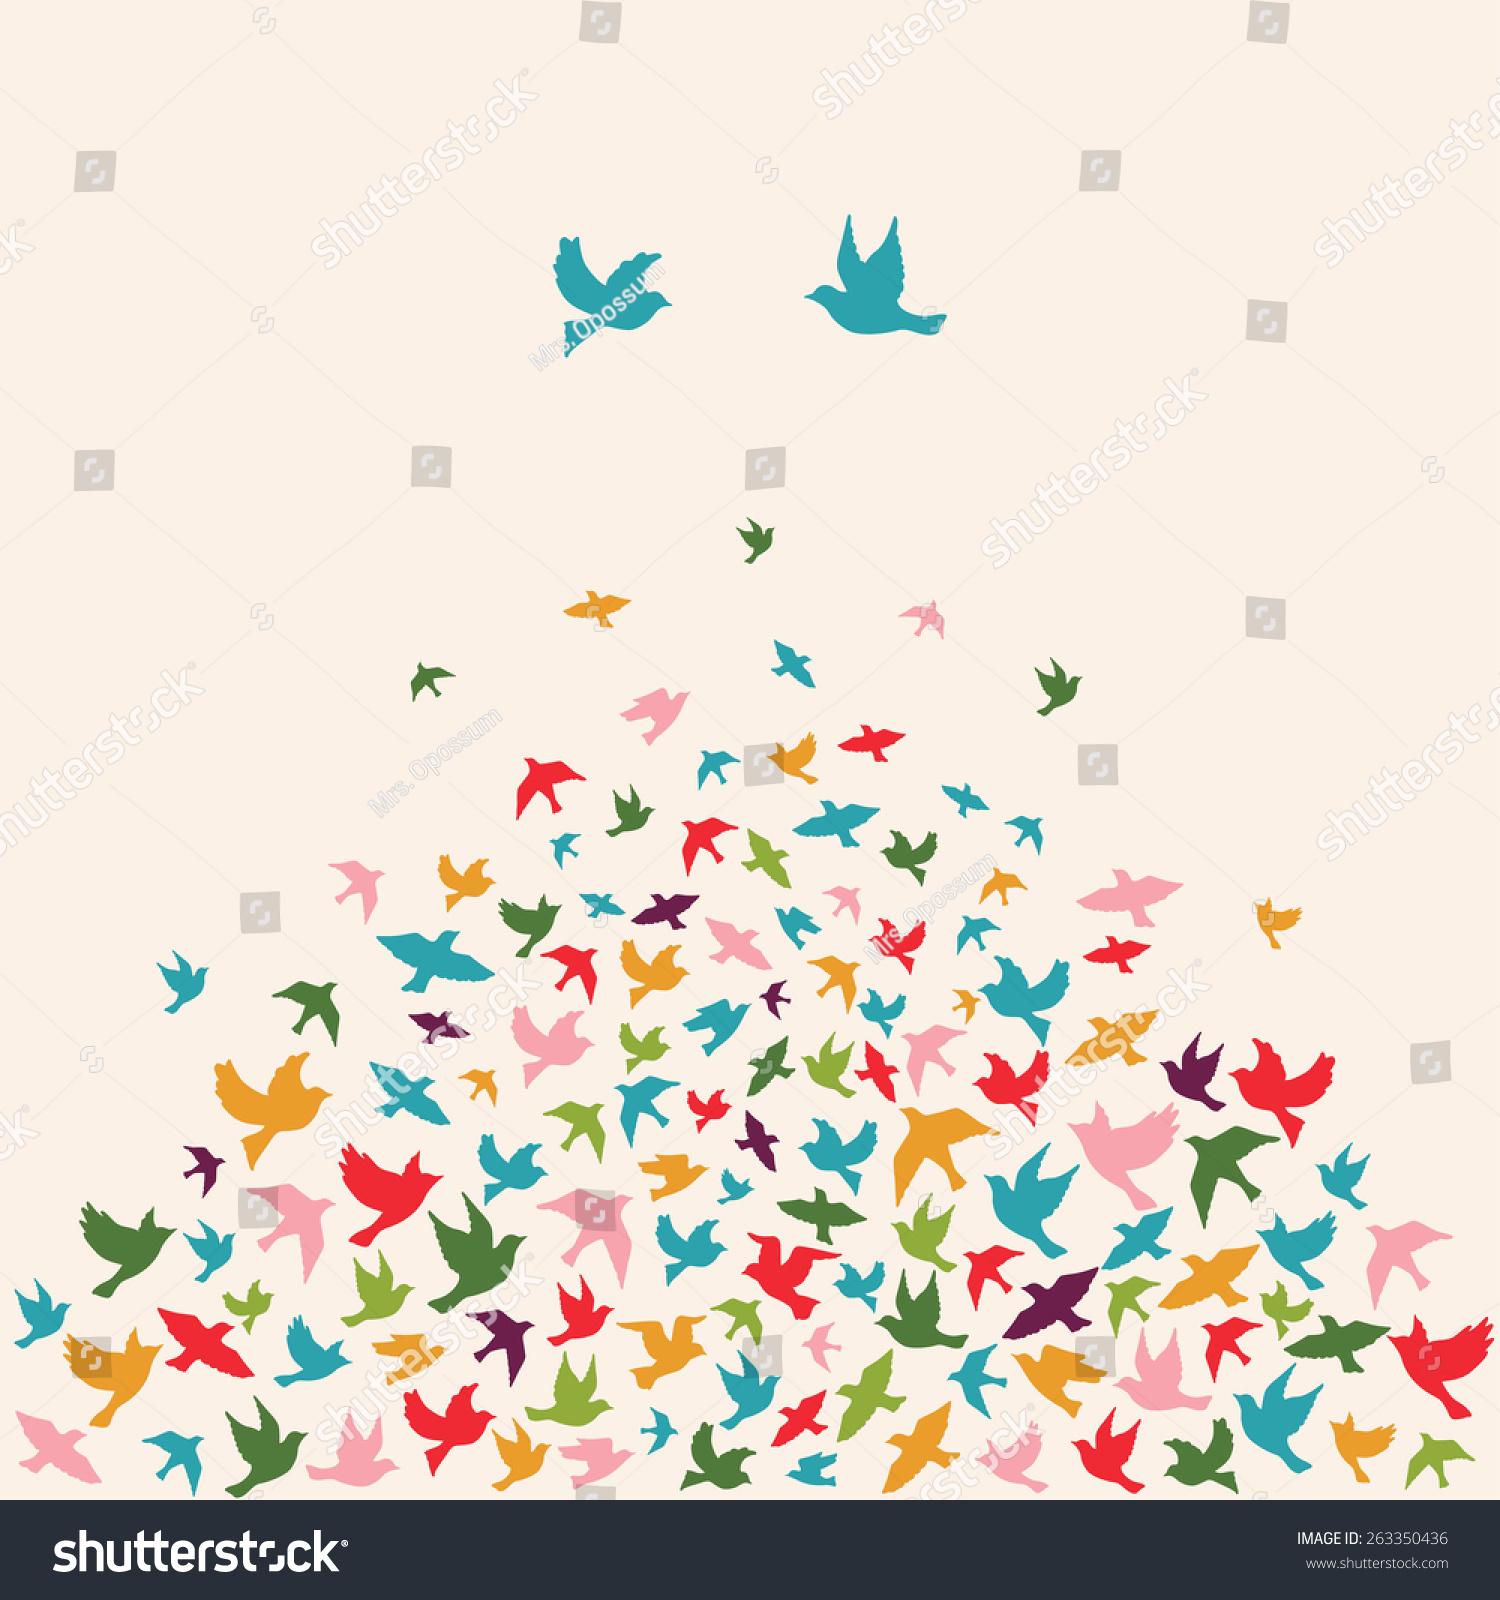 Stock Vector Silhouettes Of Flying Birds Vector Illustration